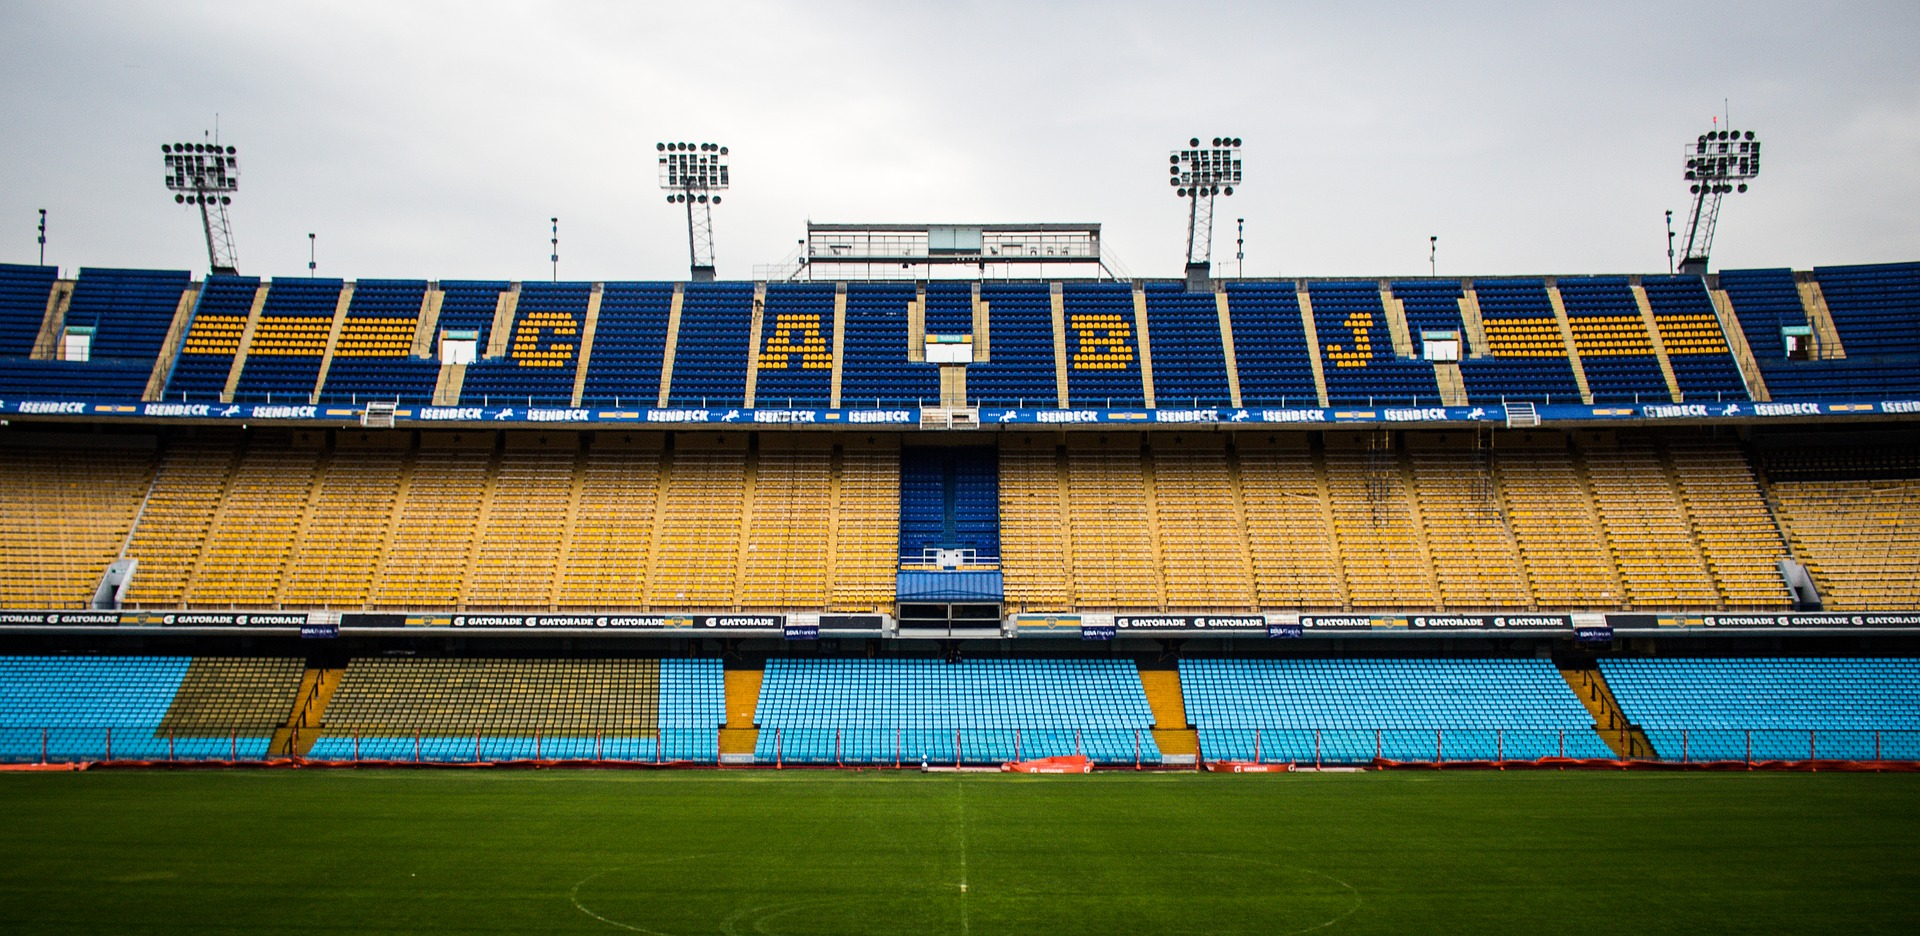 La Bombonera - the world-famous home of Club Atlético Boca Juniors.